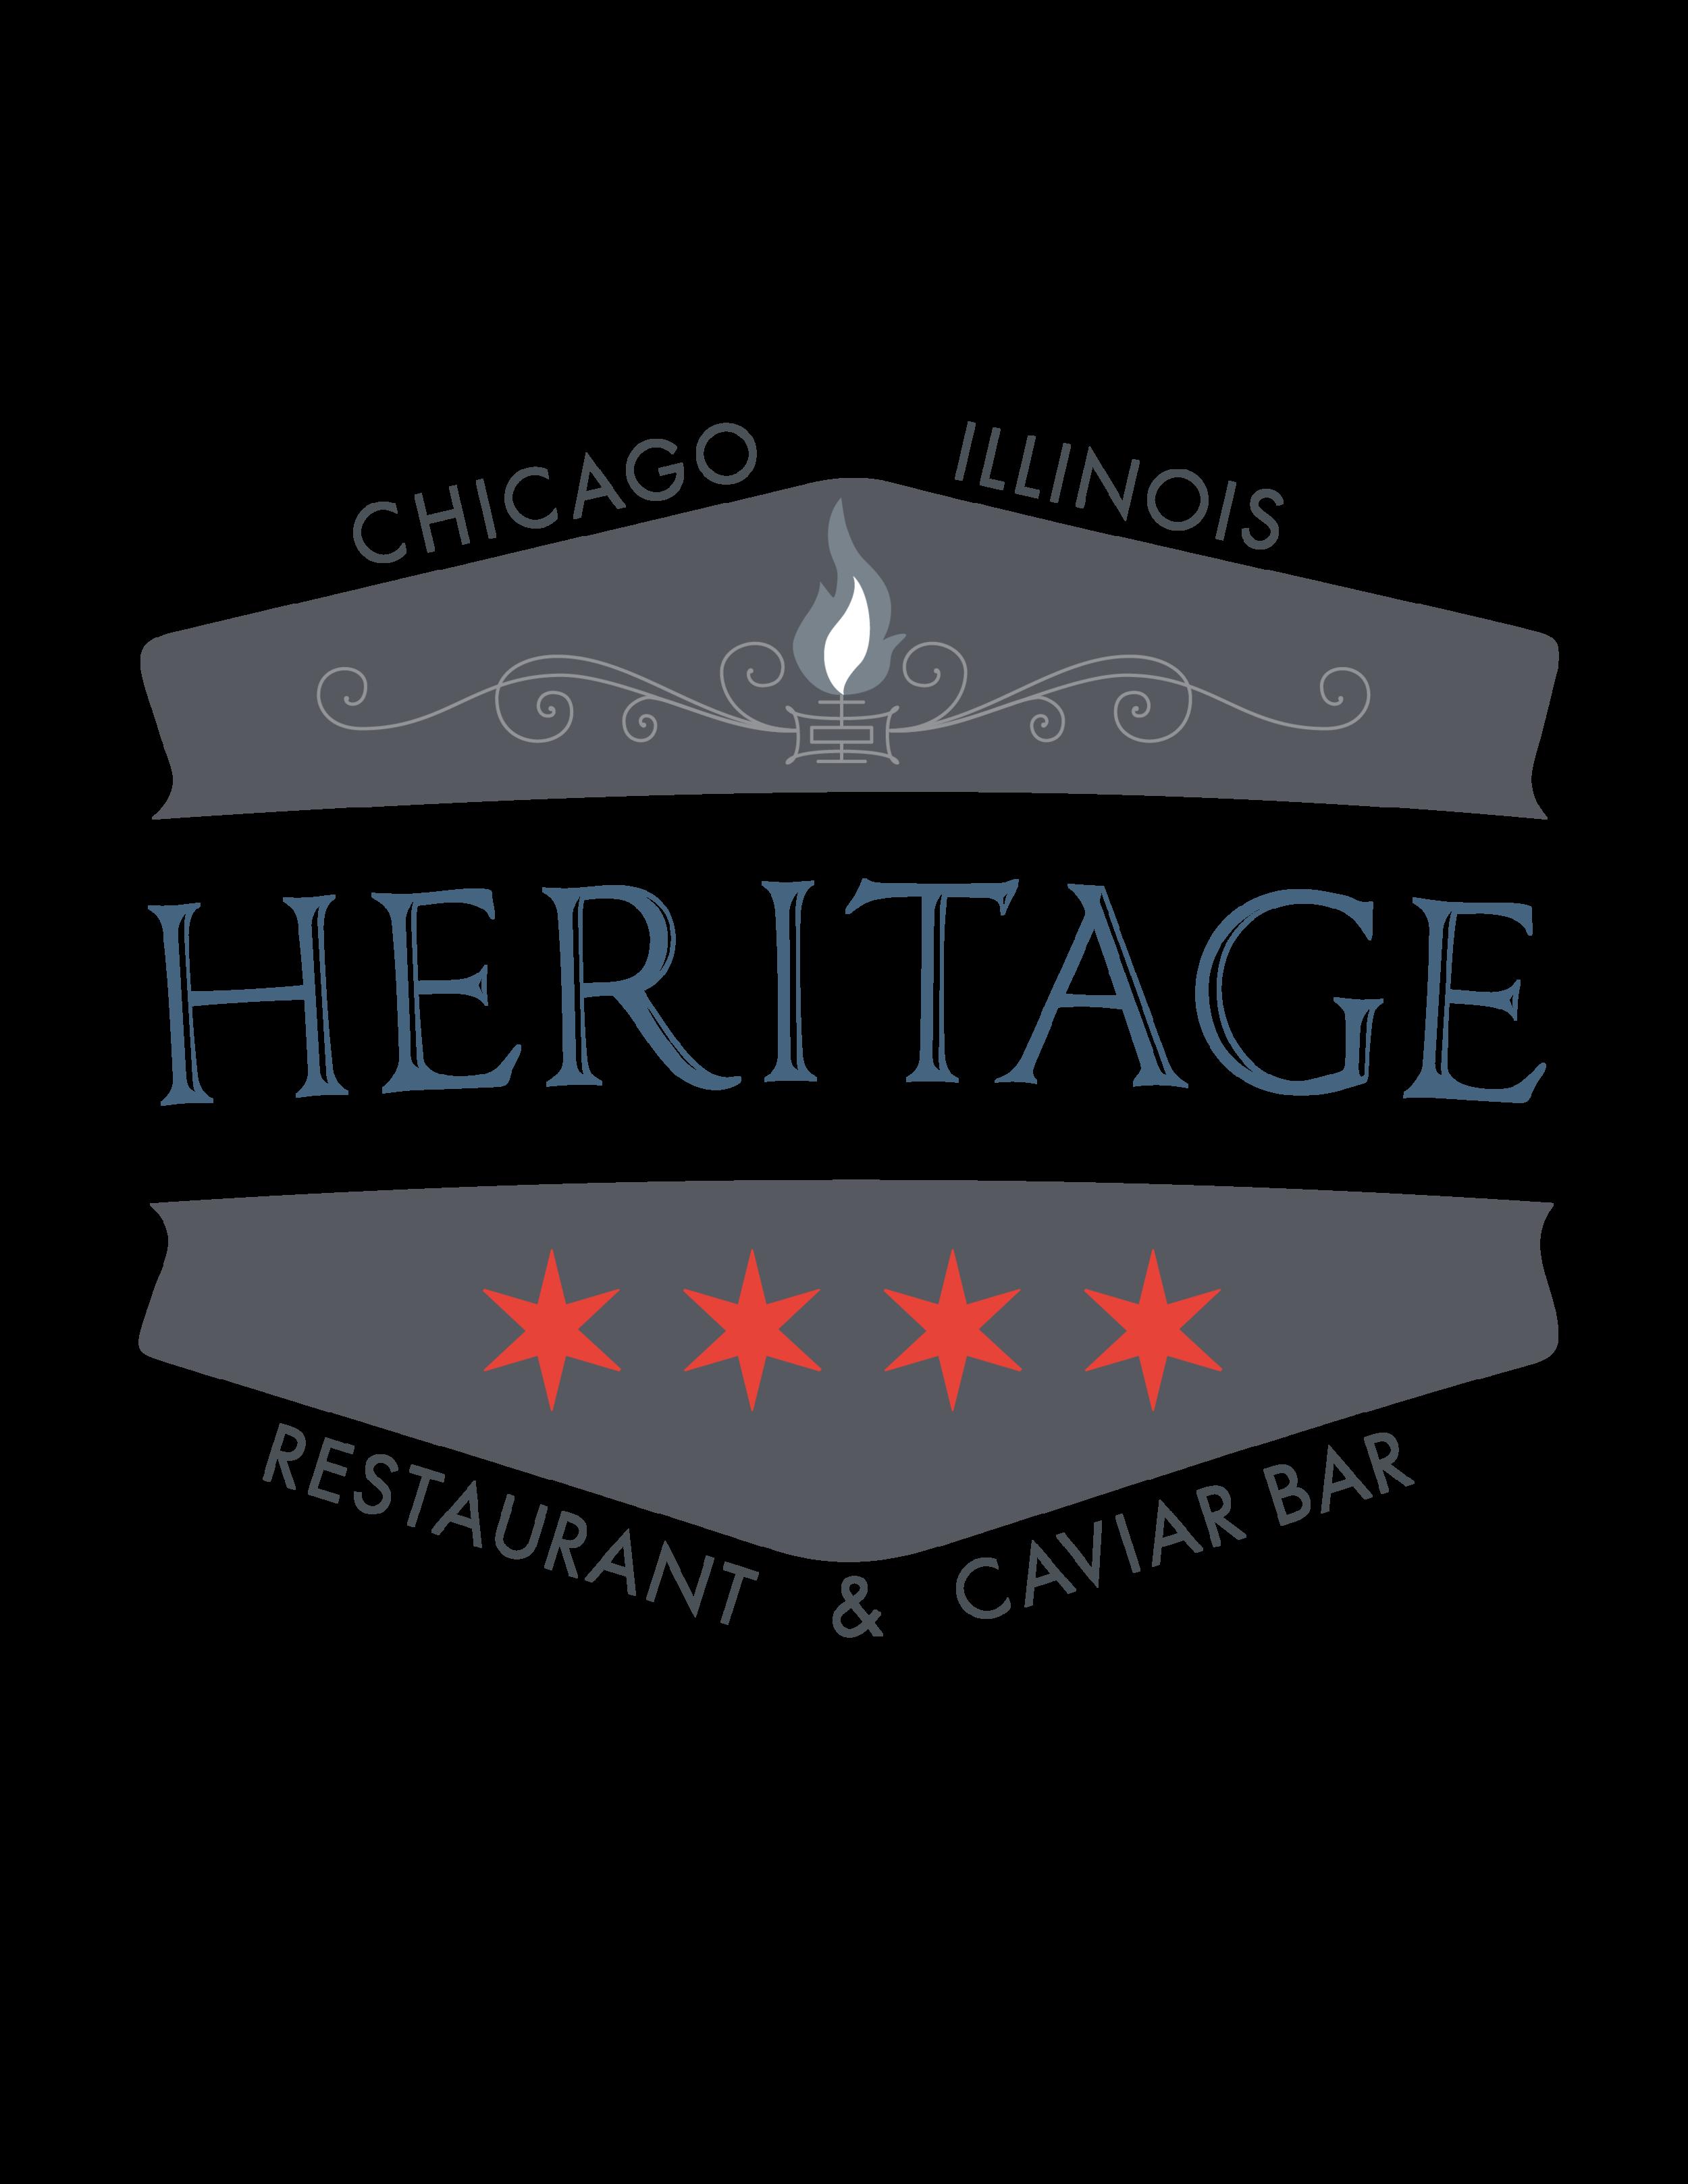 kake-chicago-content-creation-heritage-restaurant-caviar-bar